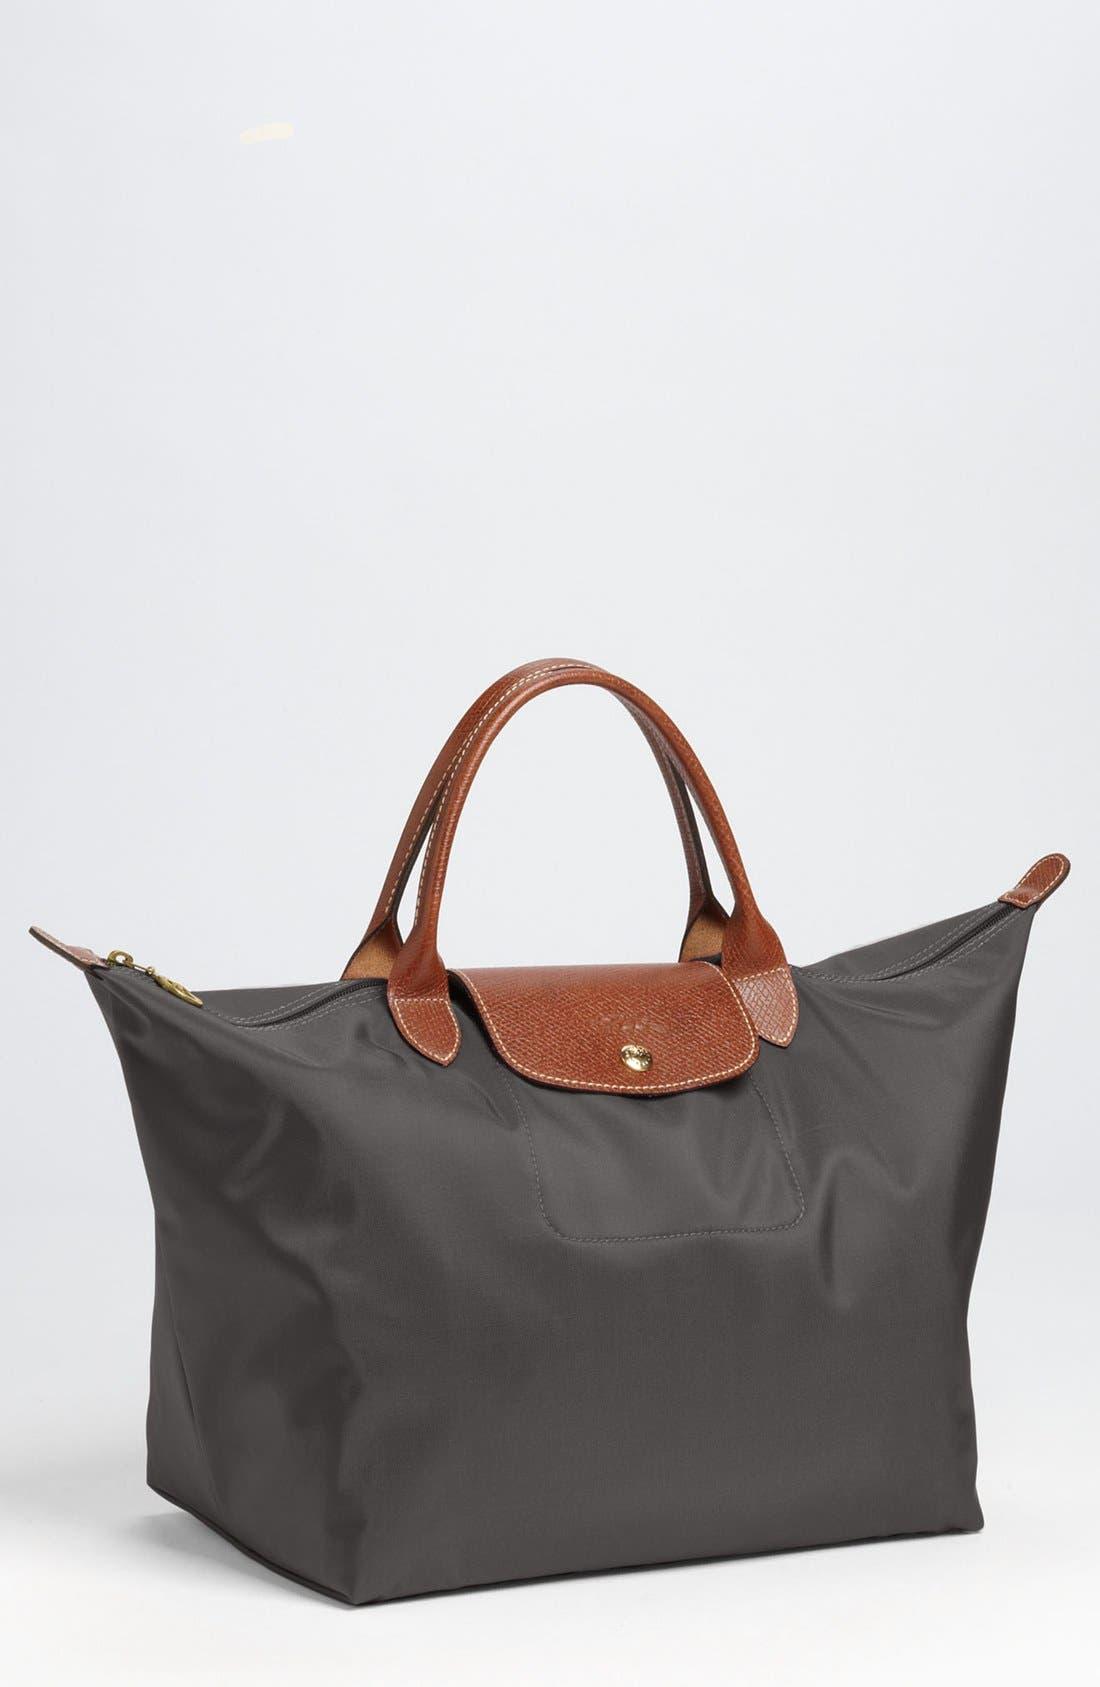 Longchamp 'Medium Le Pliage' Top Handle Tote